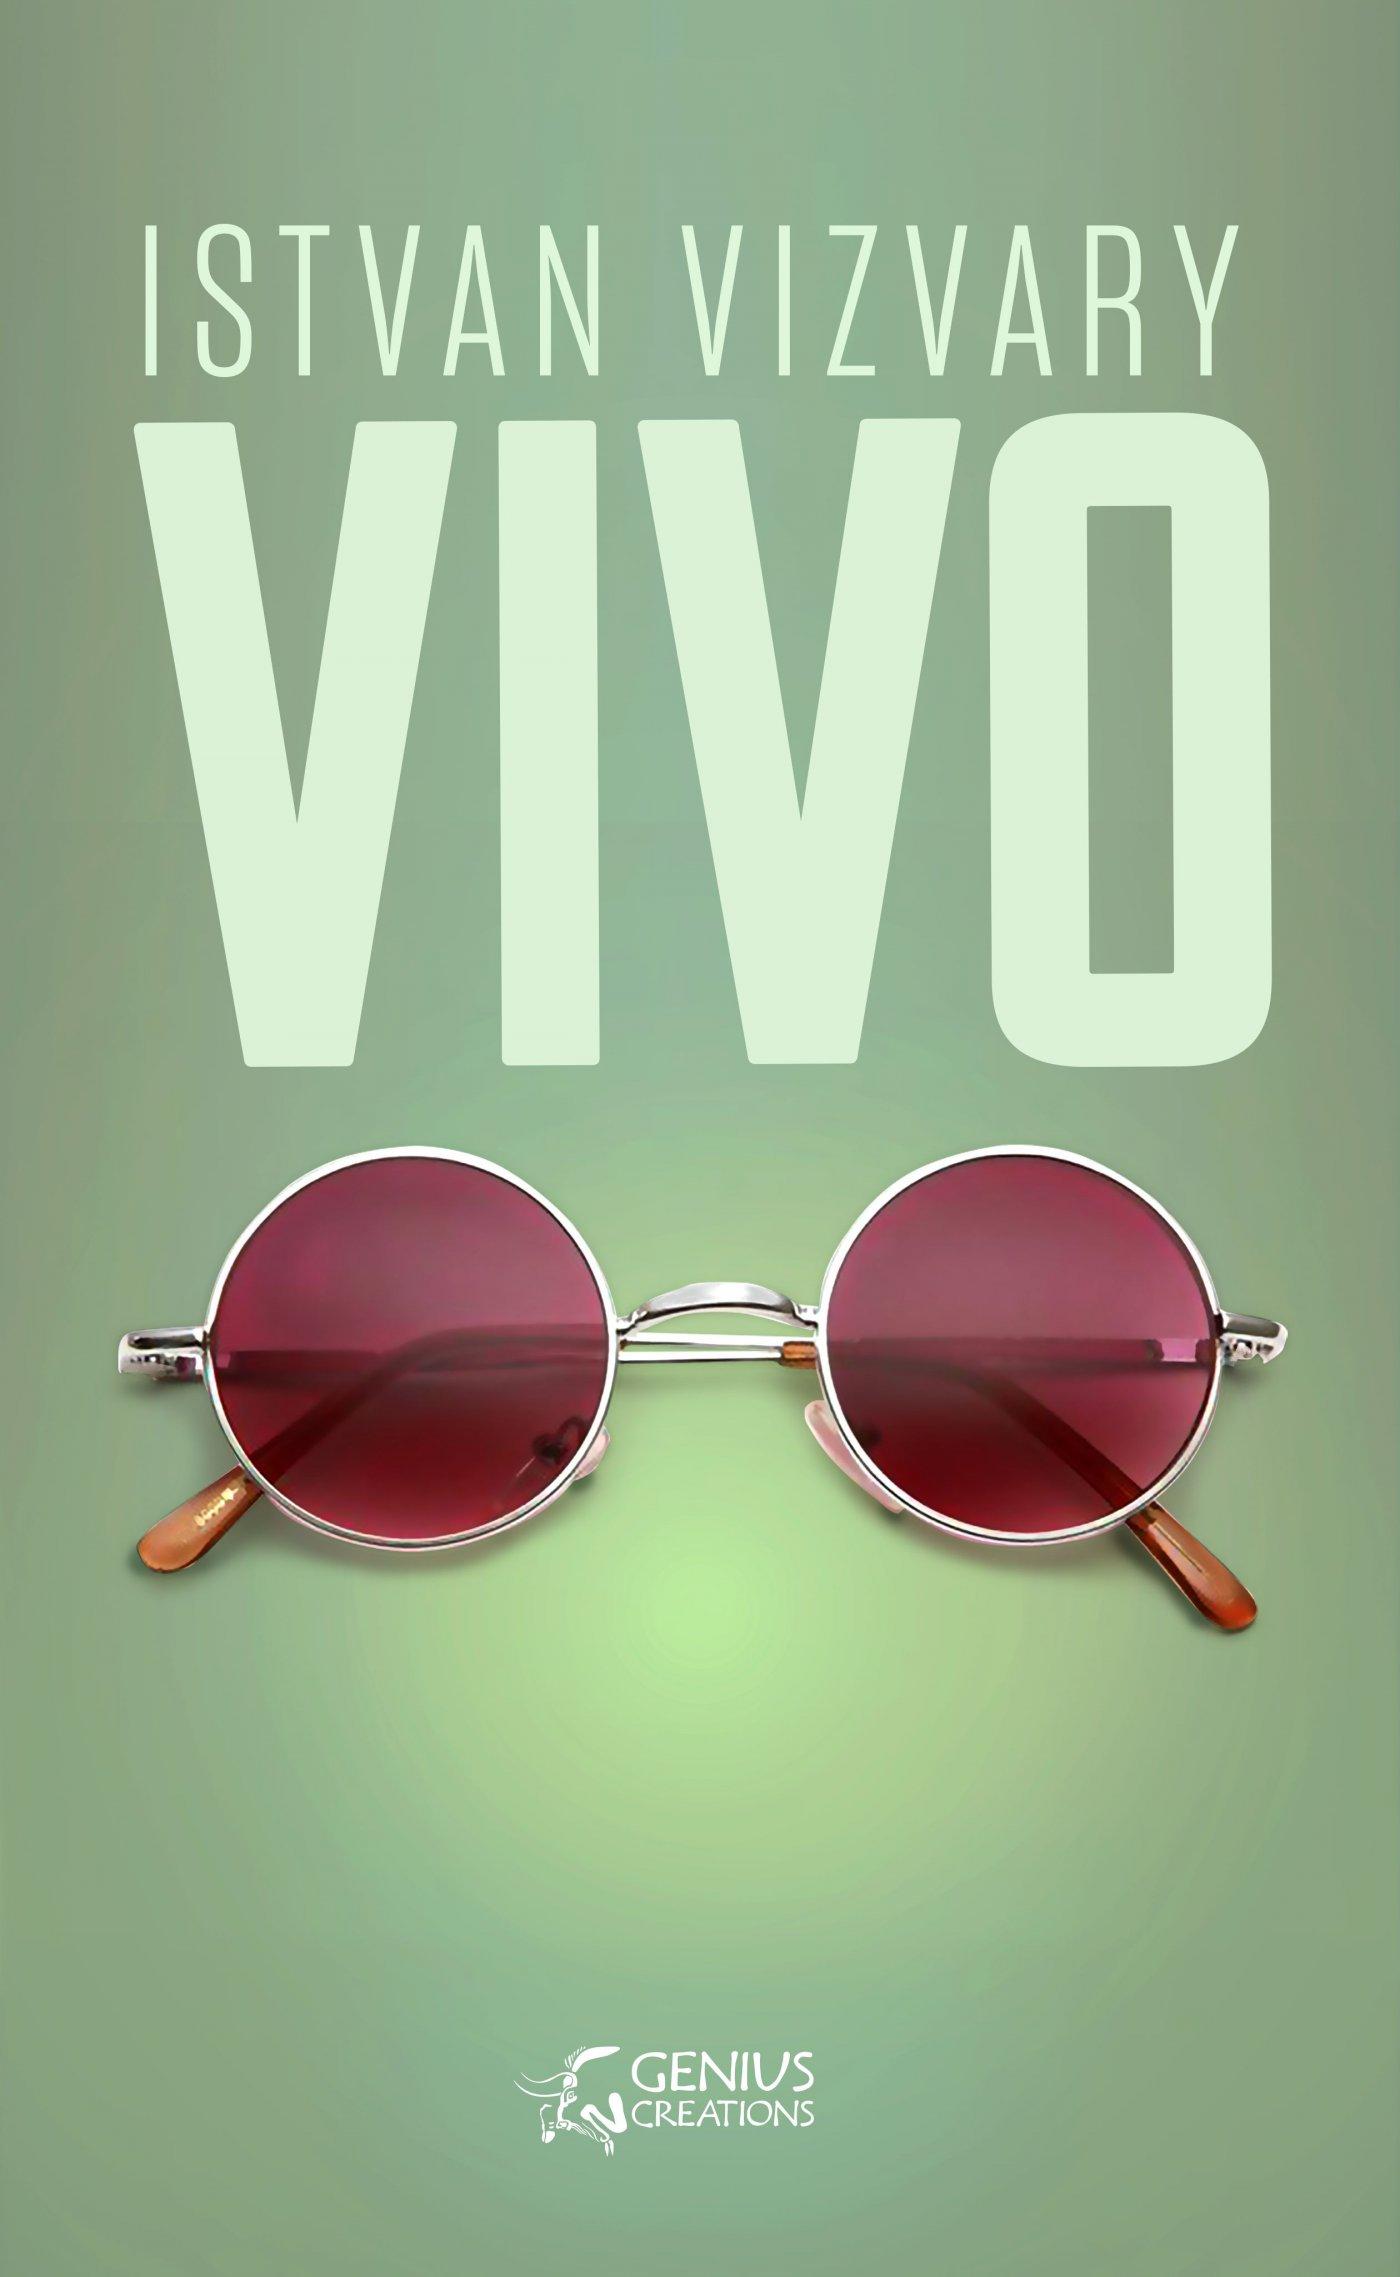 Vivo - Ebook (Książka na Kindle) do pobrania w formacie MOBI